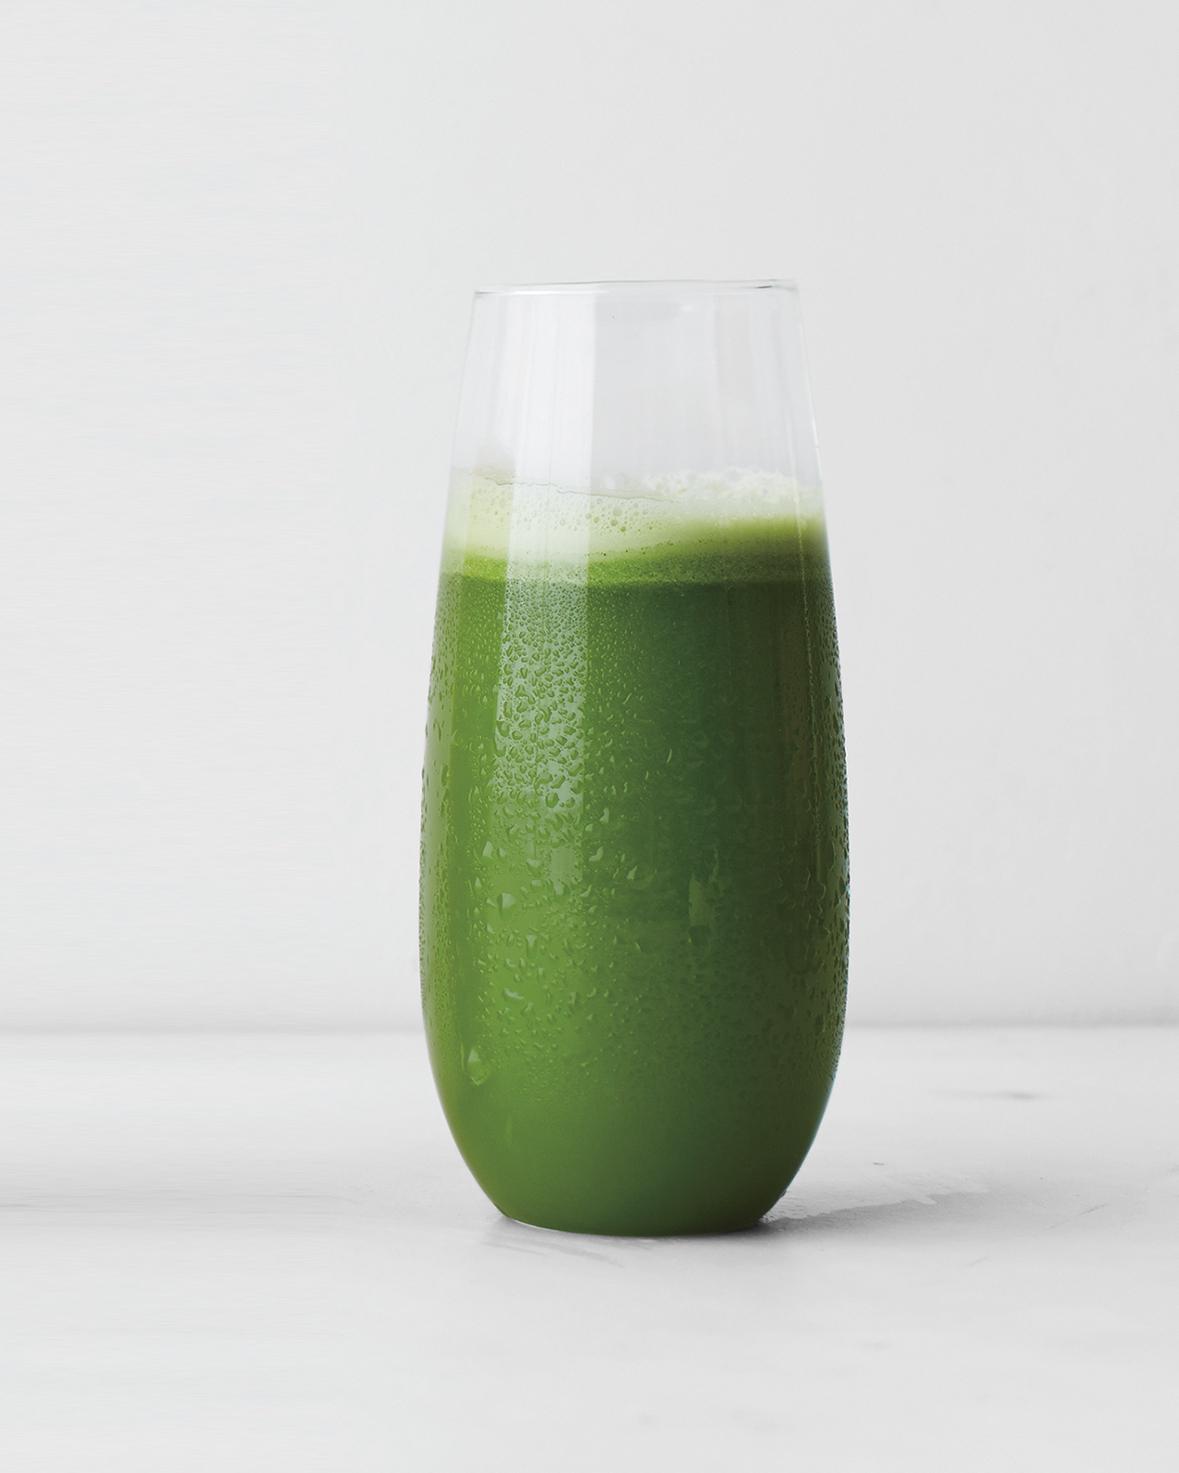 clean-slate-juice-cucumber-pear-0115.jpg